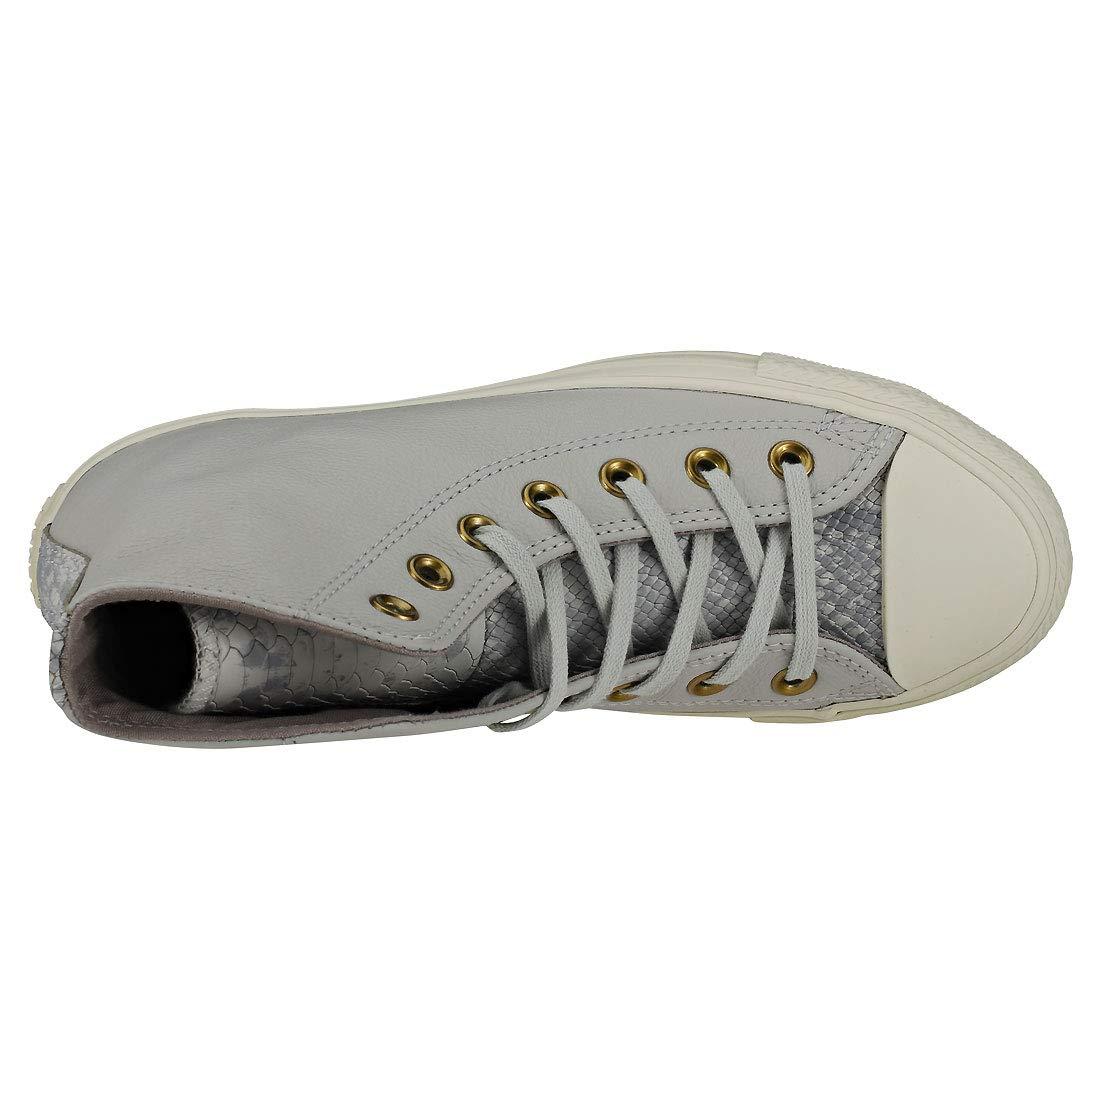 Converse Chuck Taylor Ctas Hi Scarpe da Ginnastica Basse Donna Donna Donna | Prima Consumatori  | Sig/Sig Ra Scarpa  eb76e5